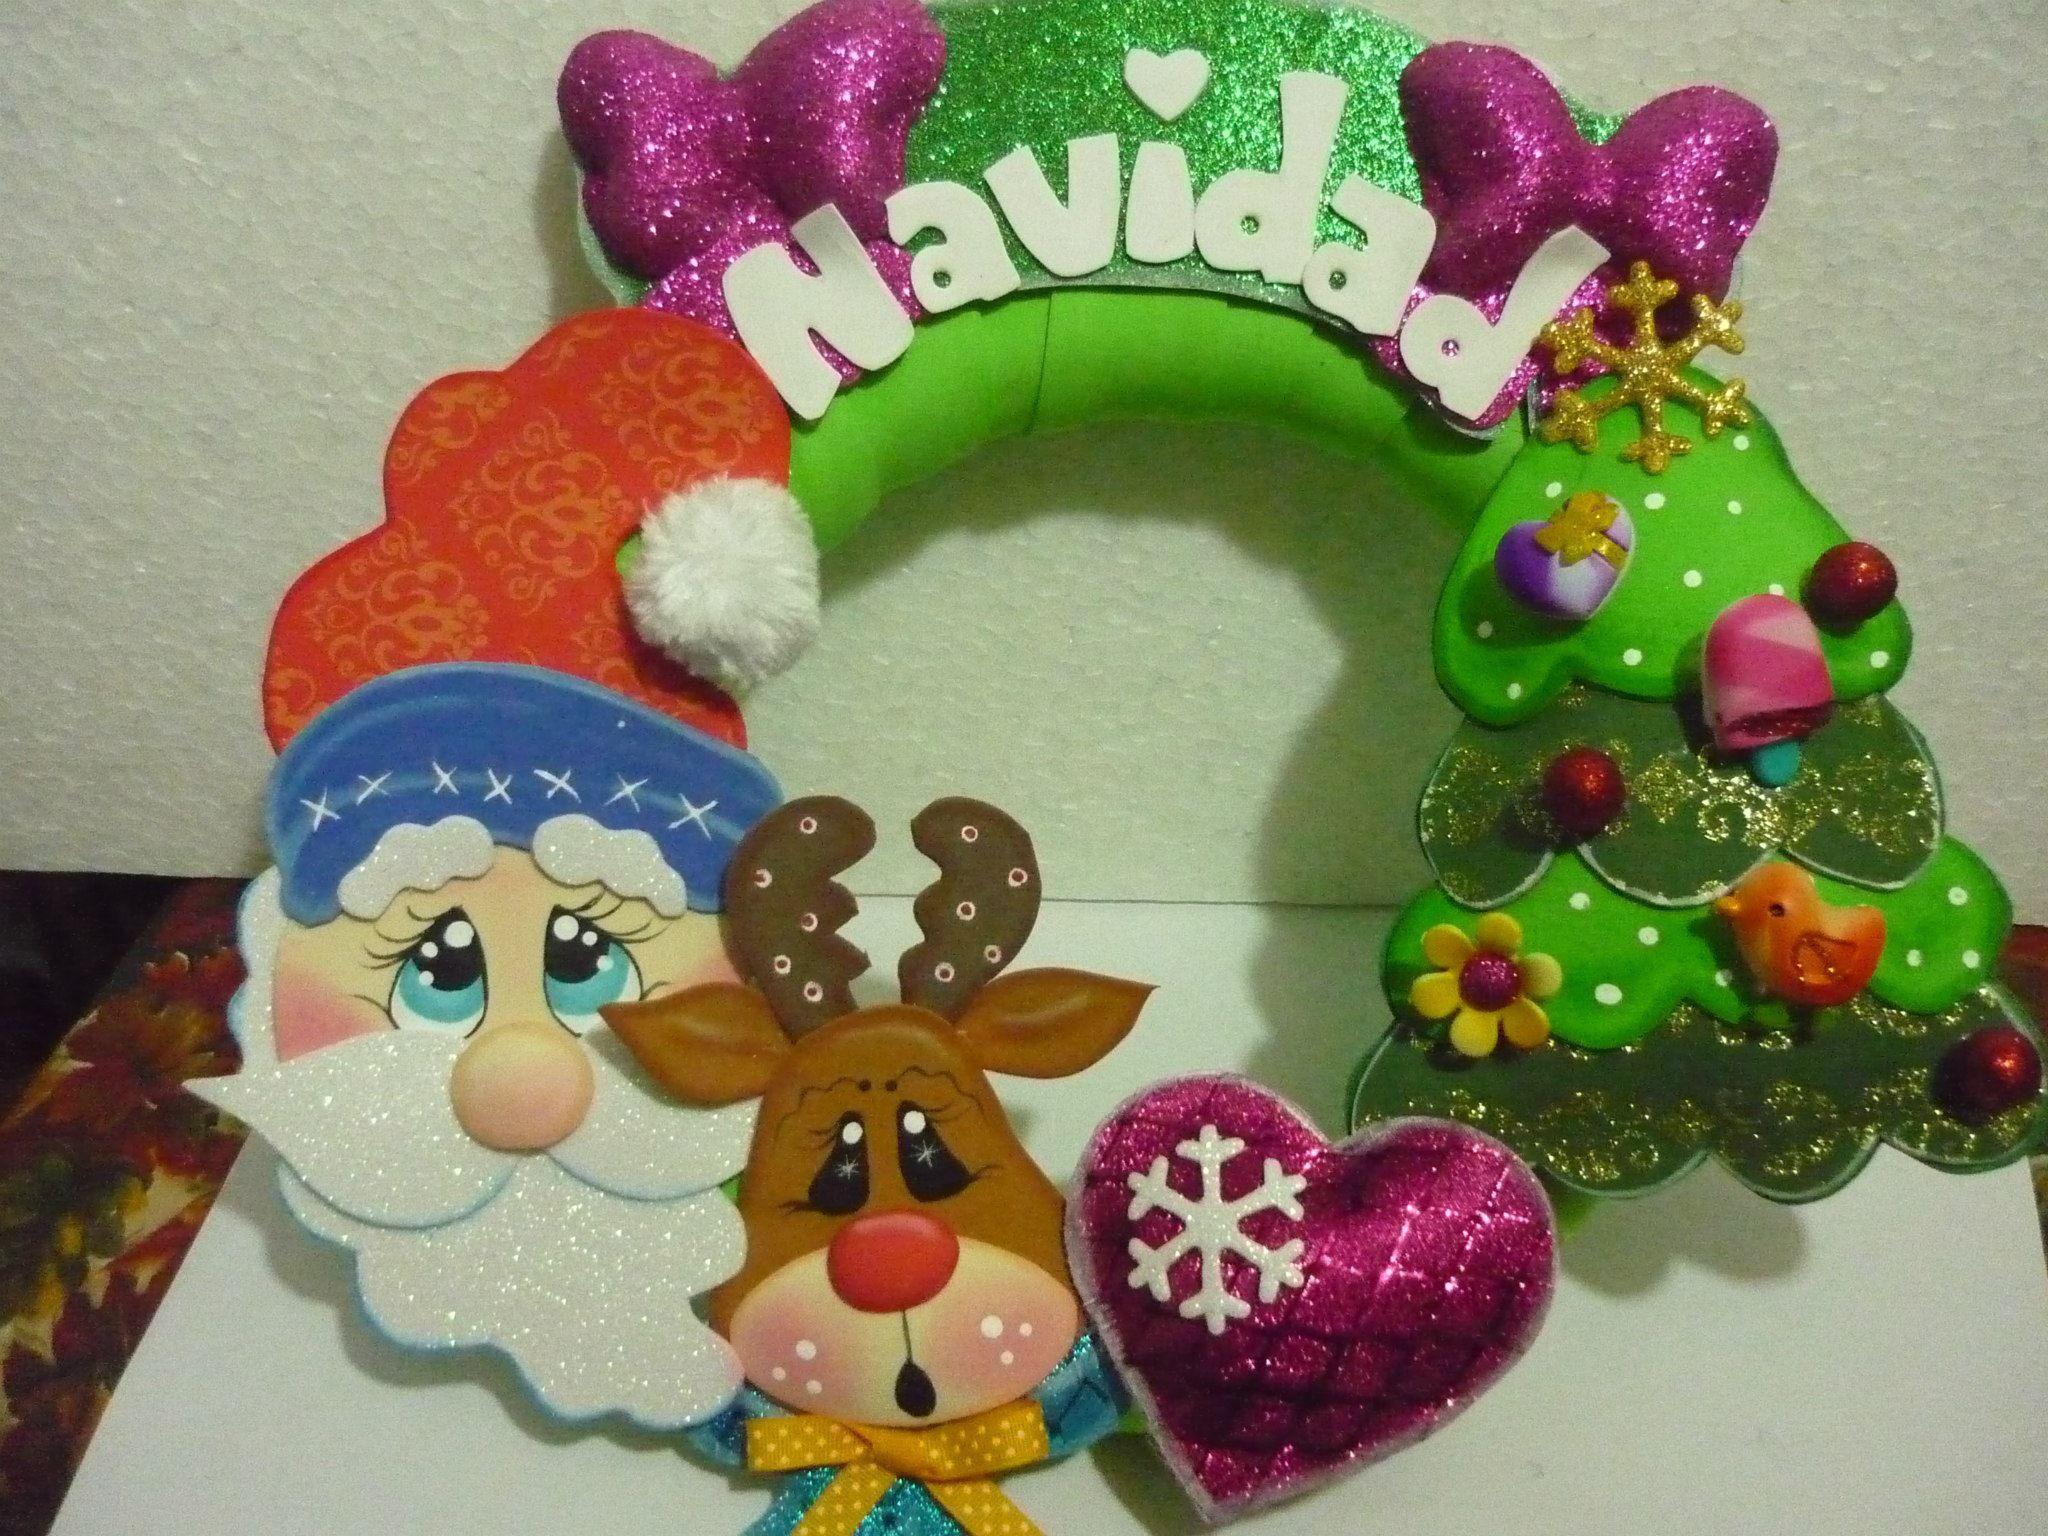 Pin by dwin garcia on foamy pinterest navidad father - Manualidades navidad faciles ...